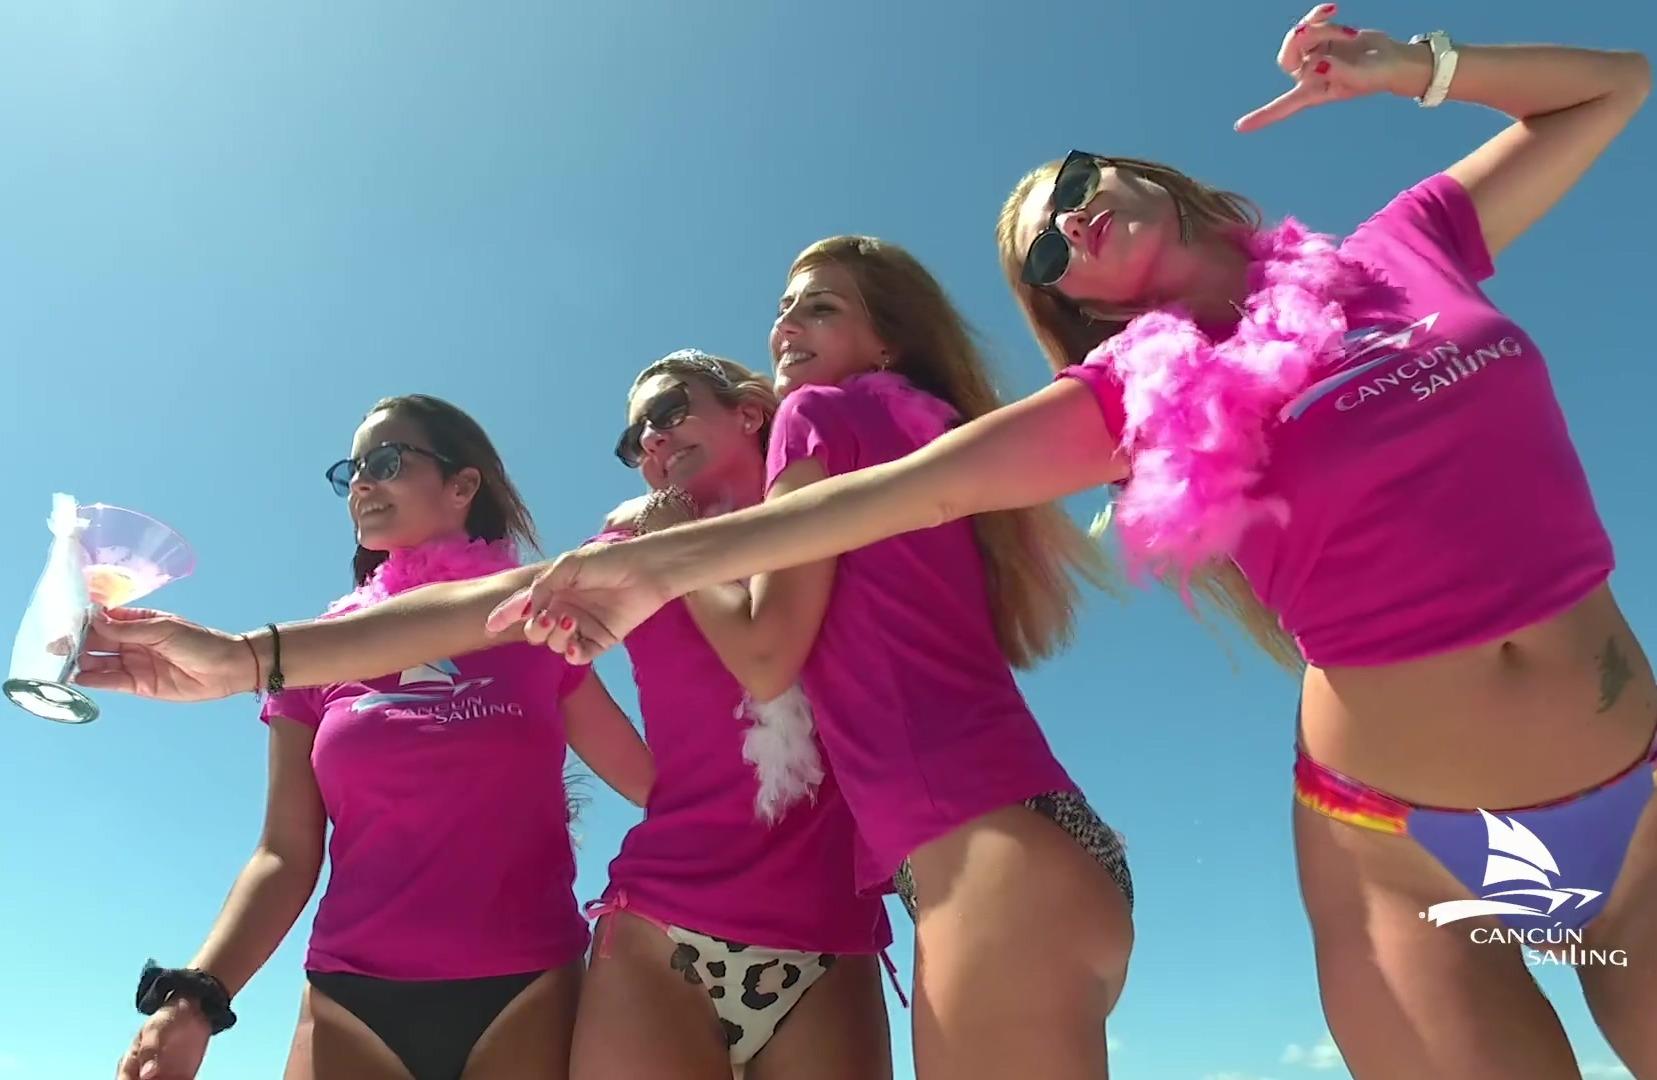 cancun bachelorette party in catamaran - isla mujeres - 15 seg-thumb-3